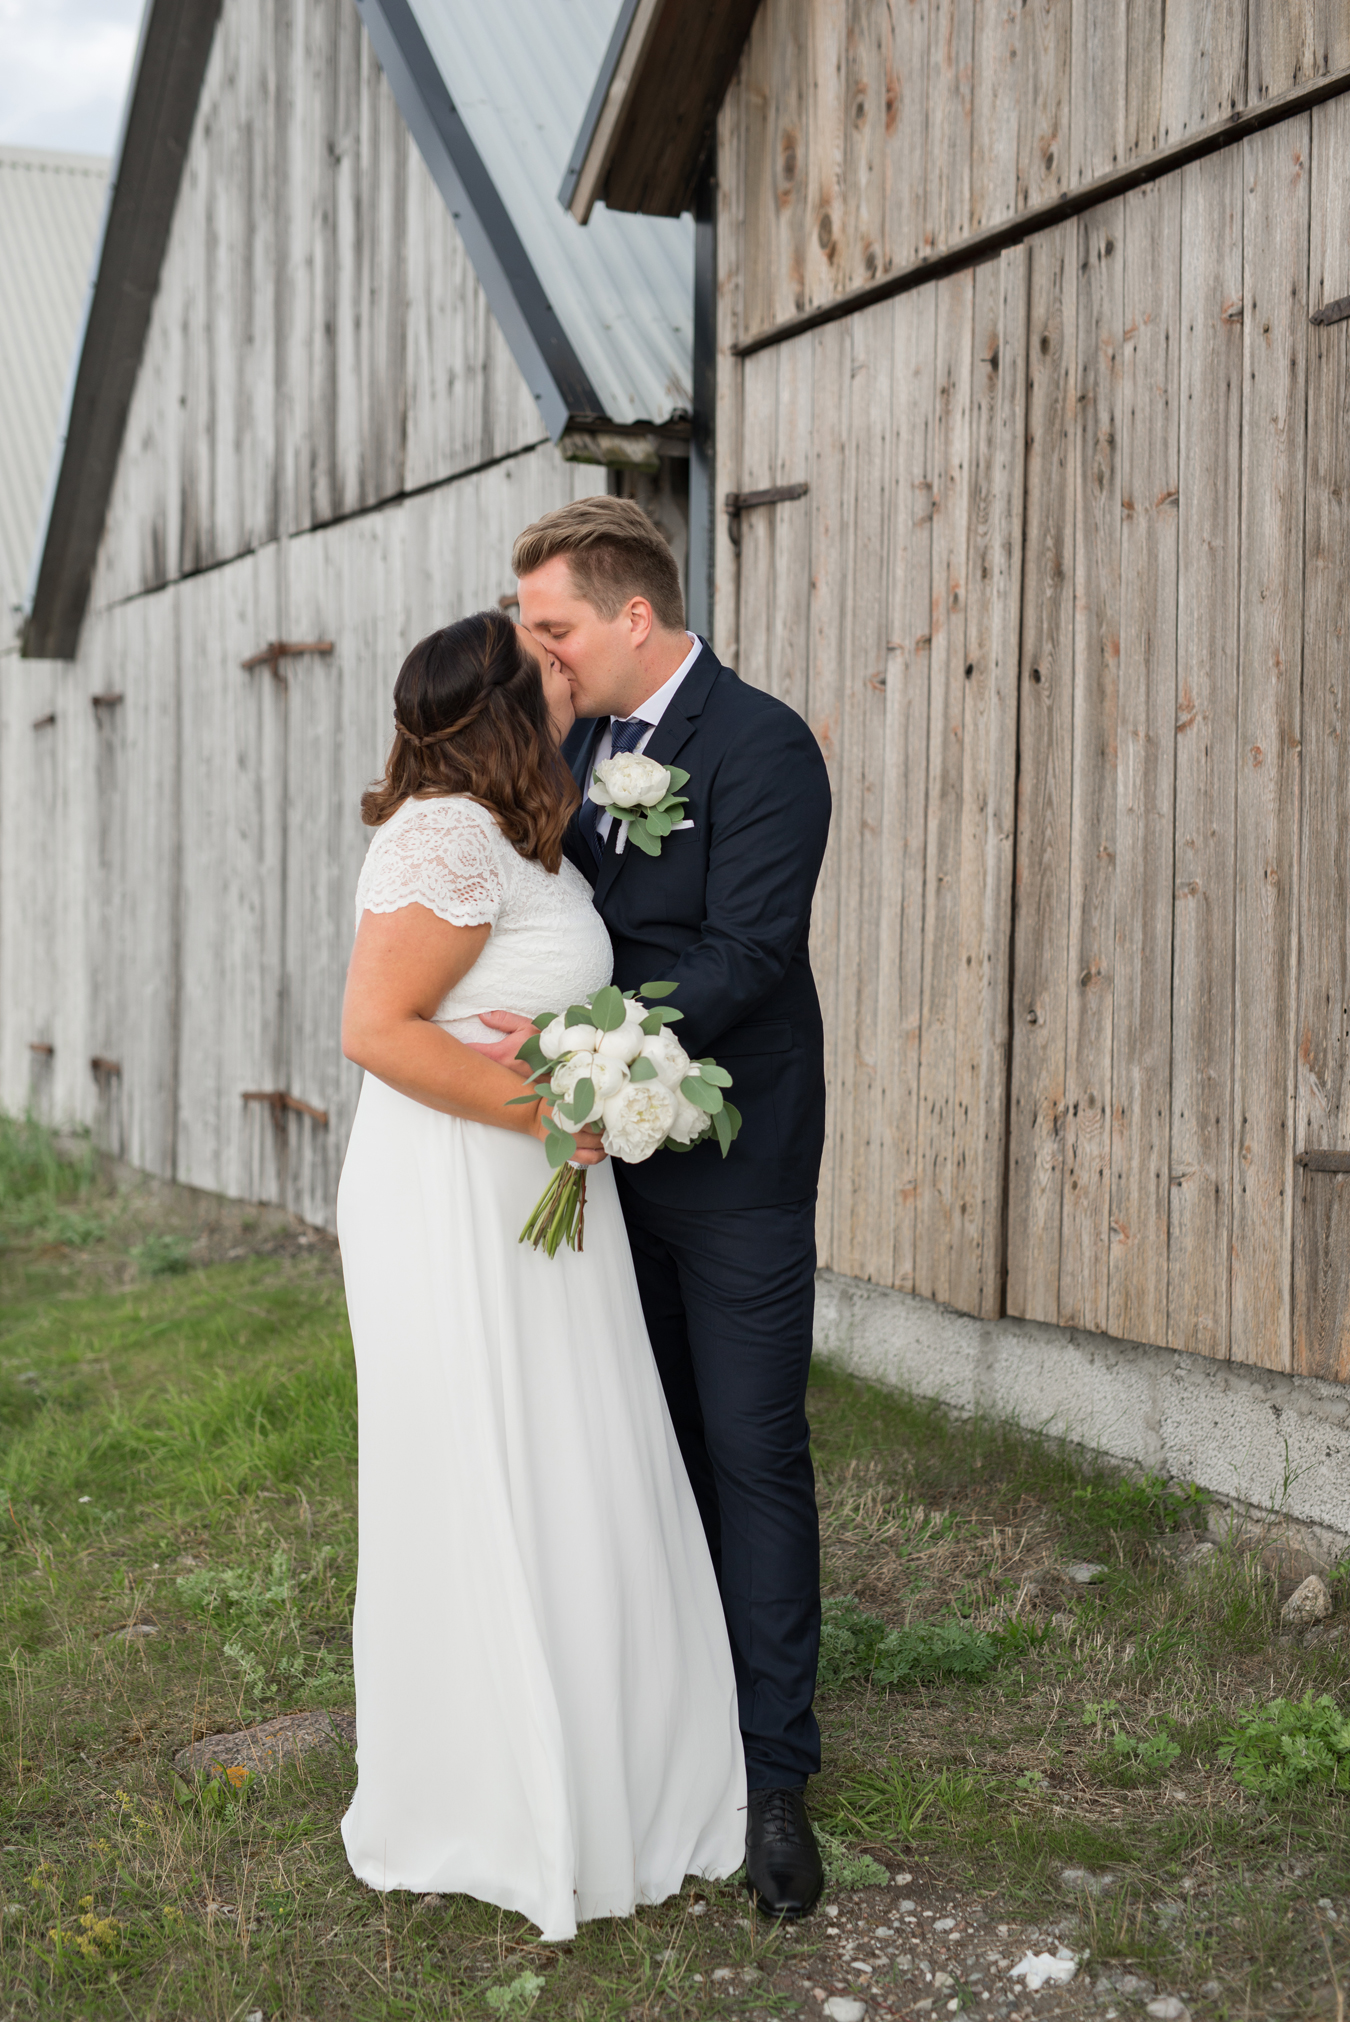 107-bröllopsfotograf-gotland-ekstakusten-neas-fotografi.jpg